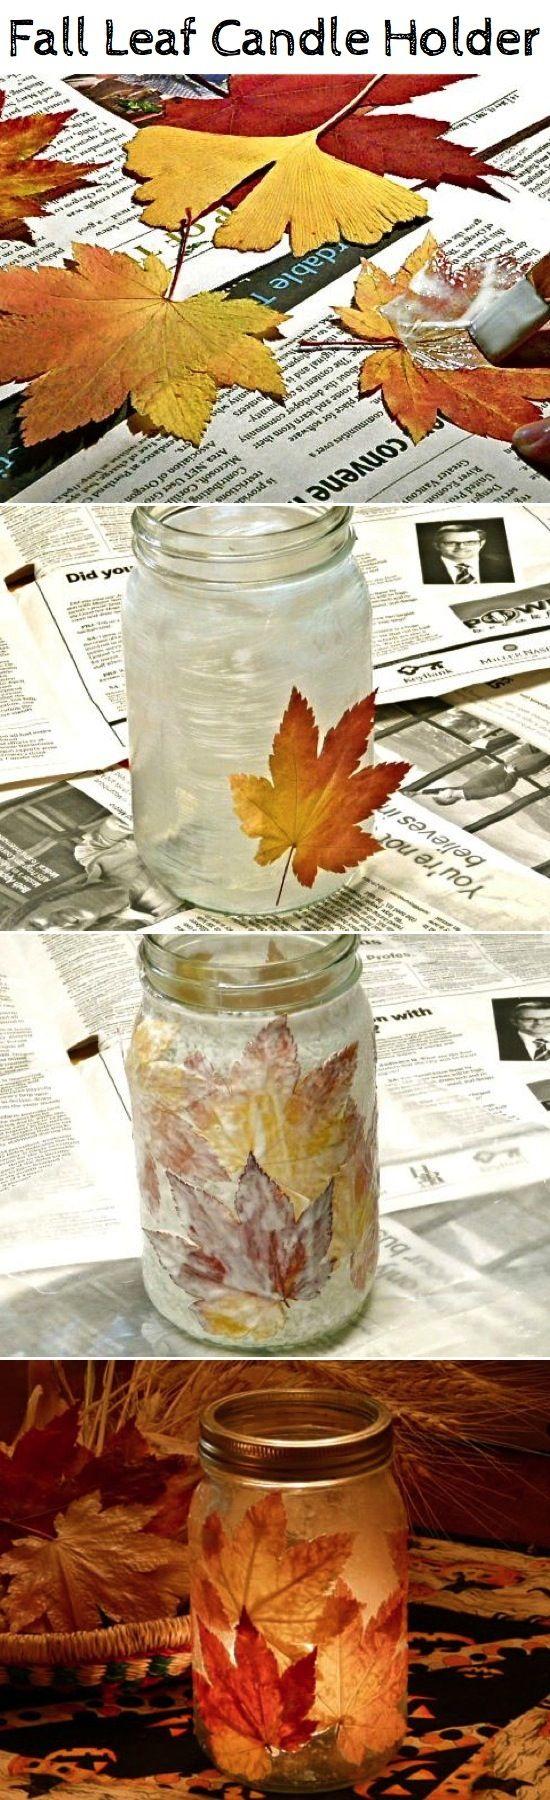 Pin by monika sante on decoration creative ideas pinterest